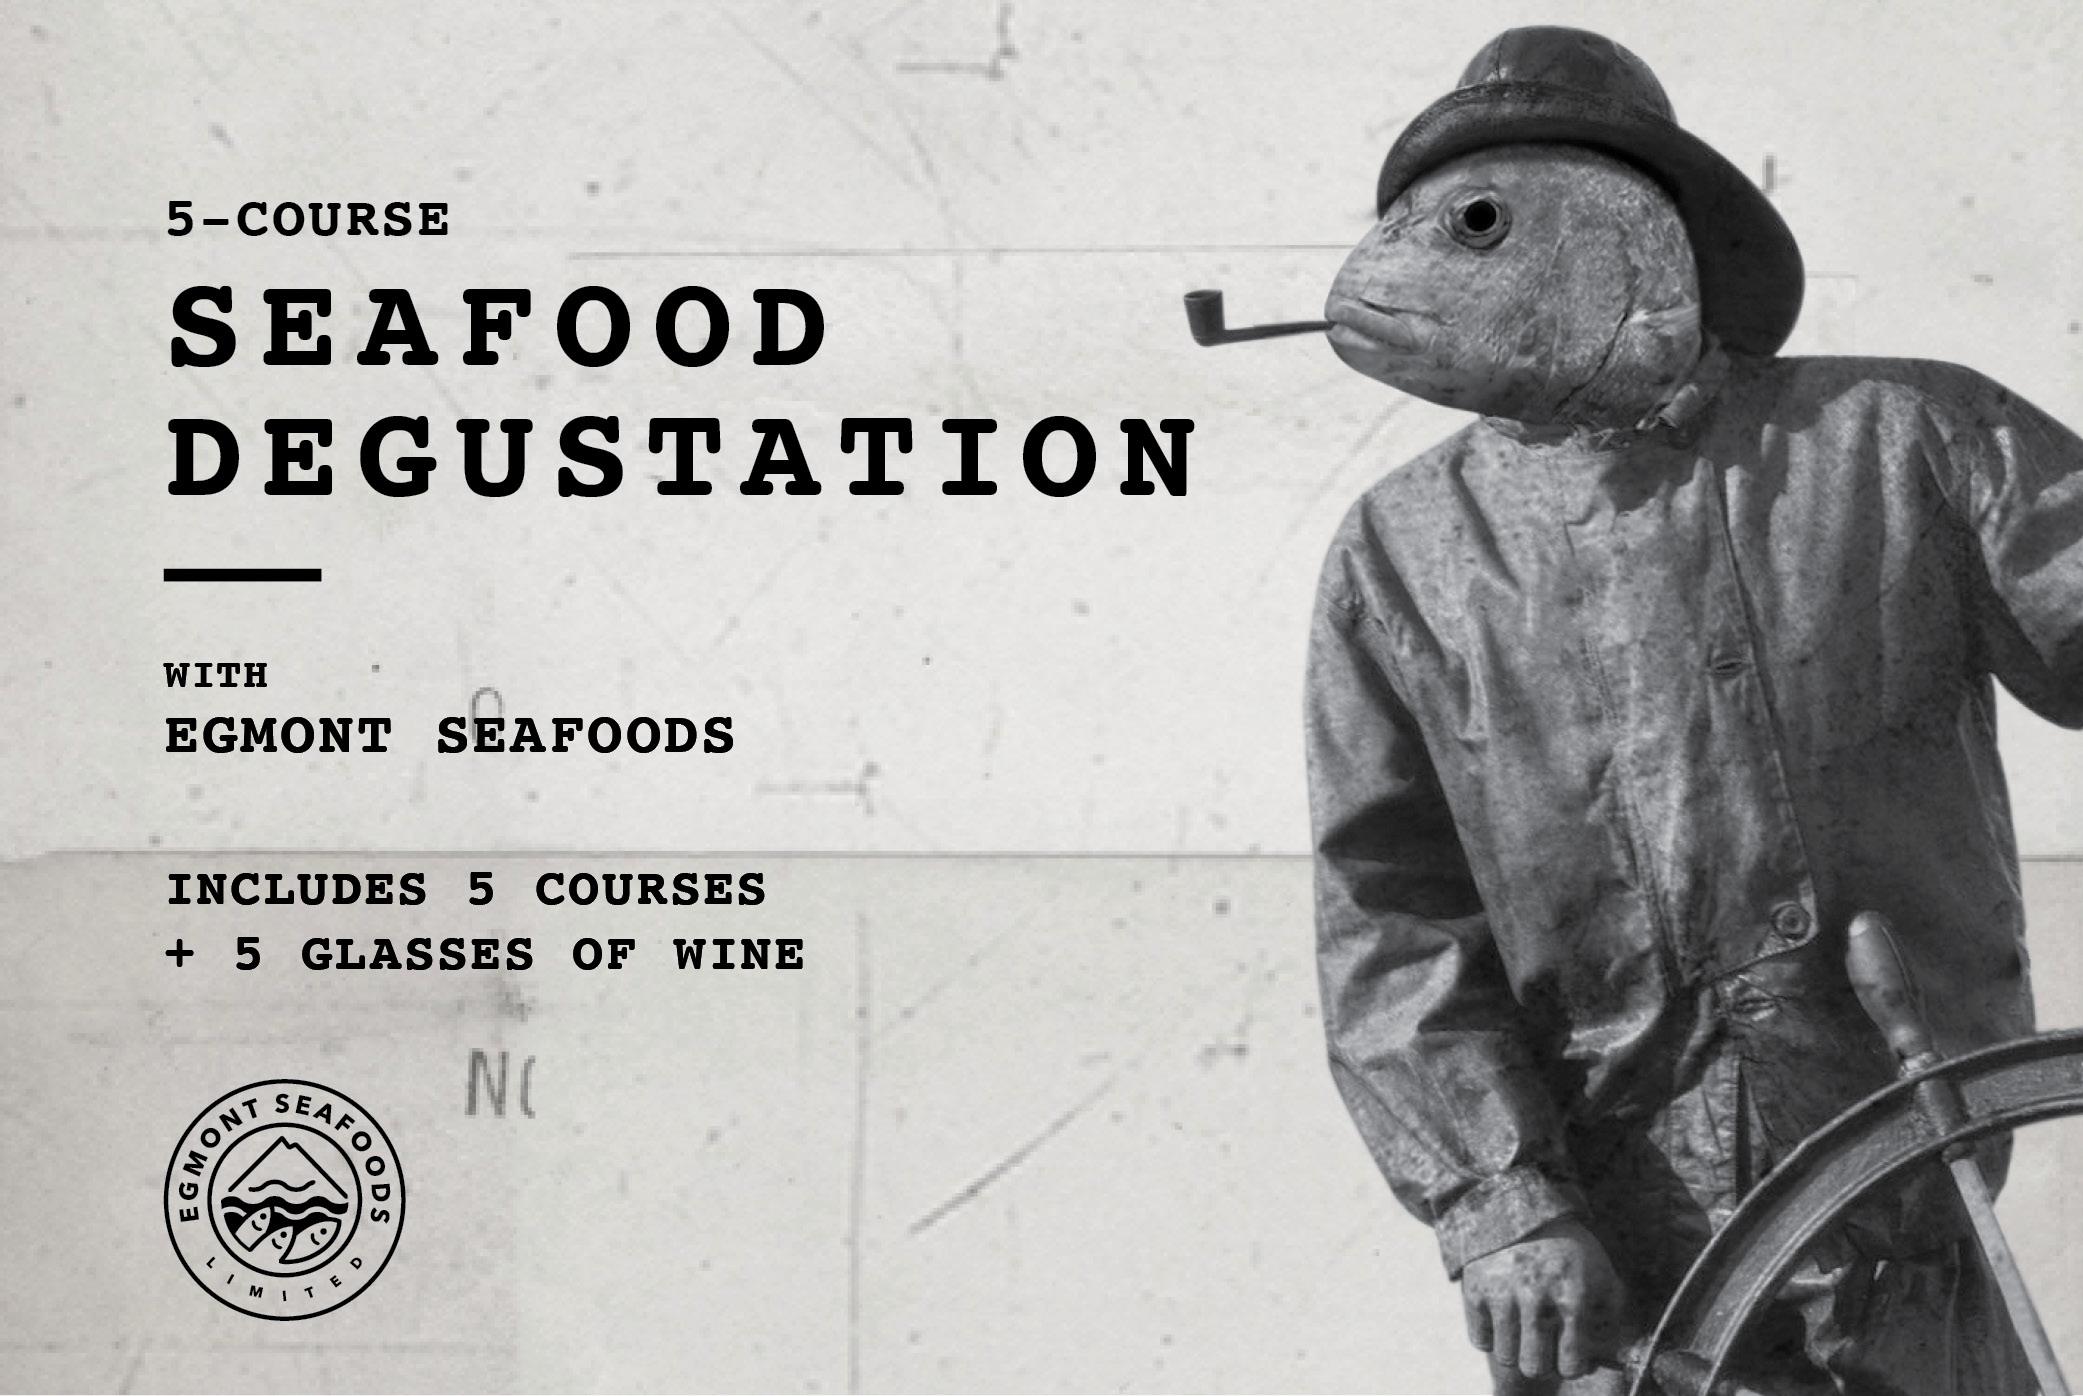 Seafood degustation_SM3.jpg